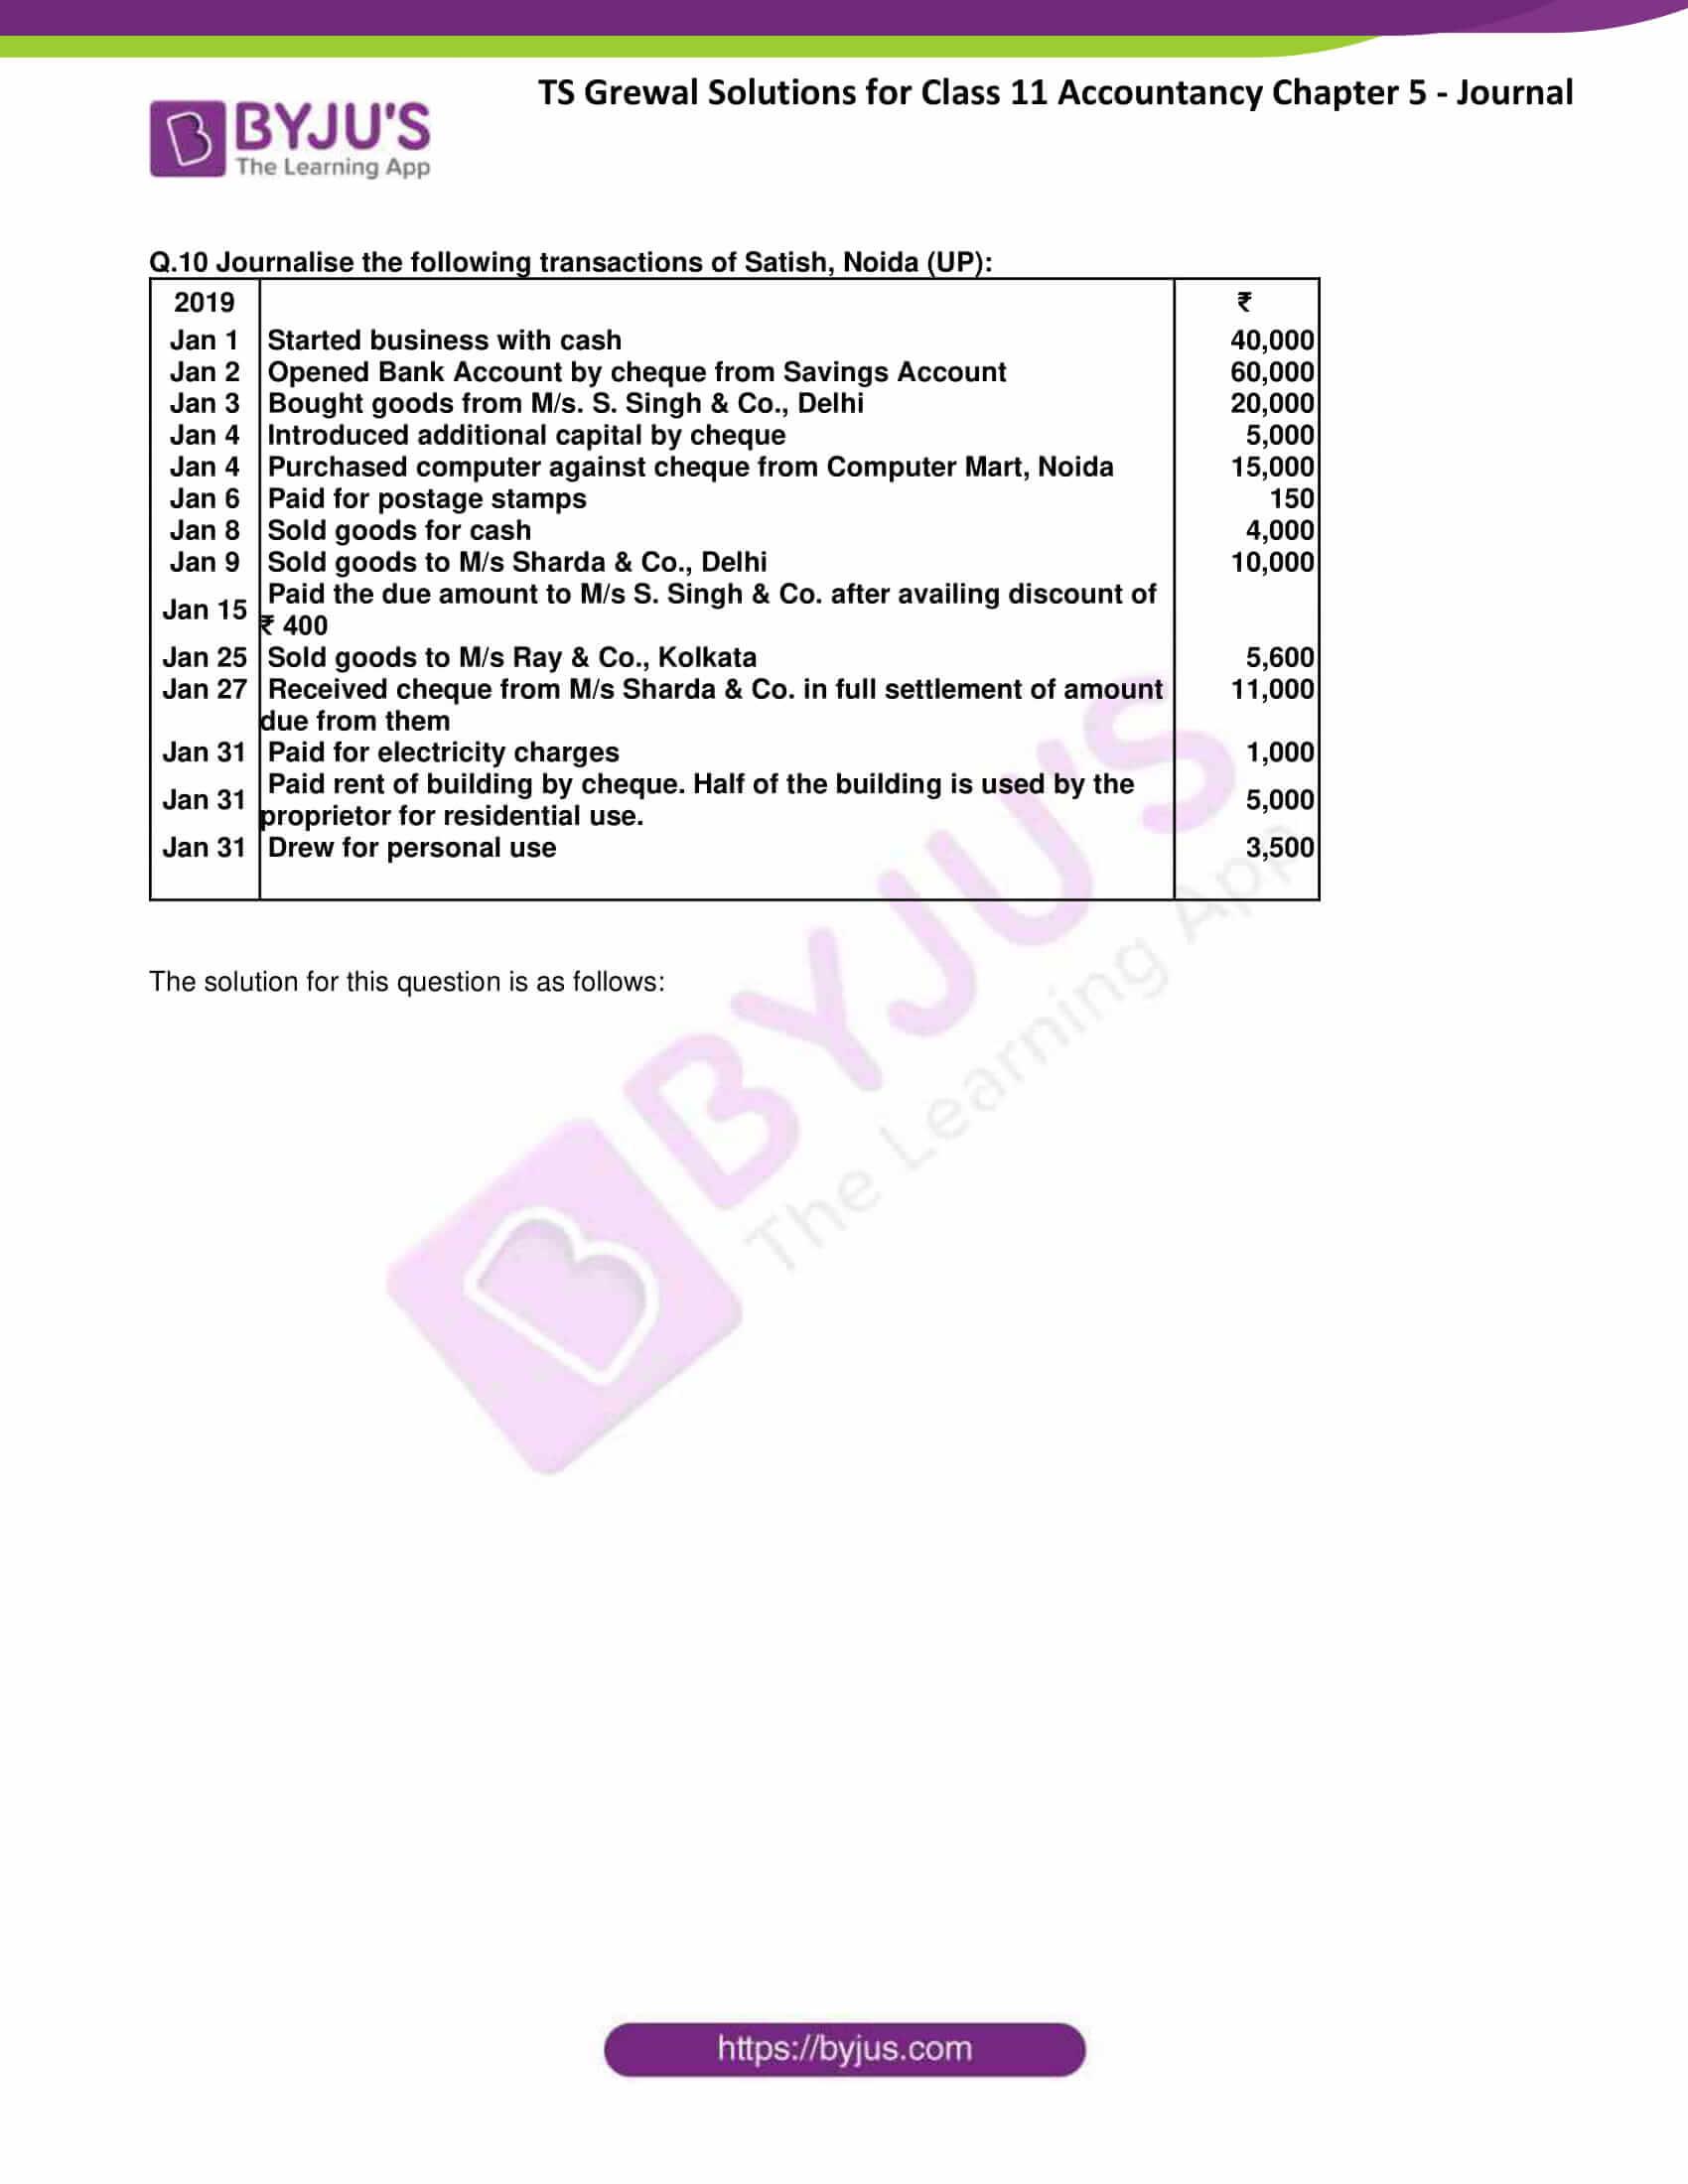 ts grewal class 11 accountancy chapter 5 journal 17